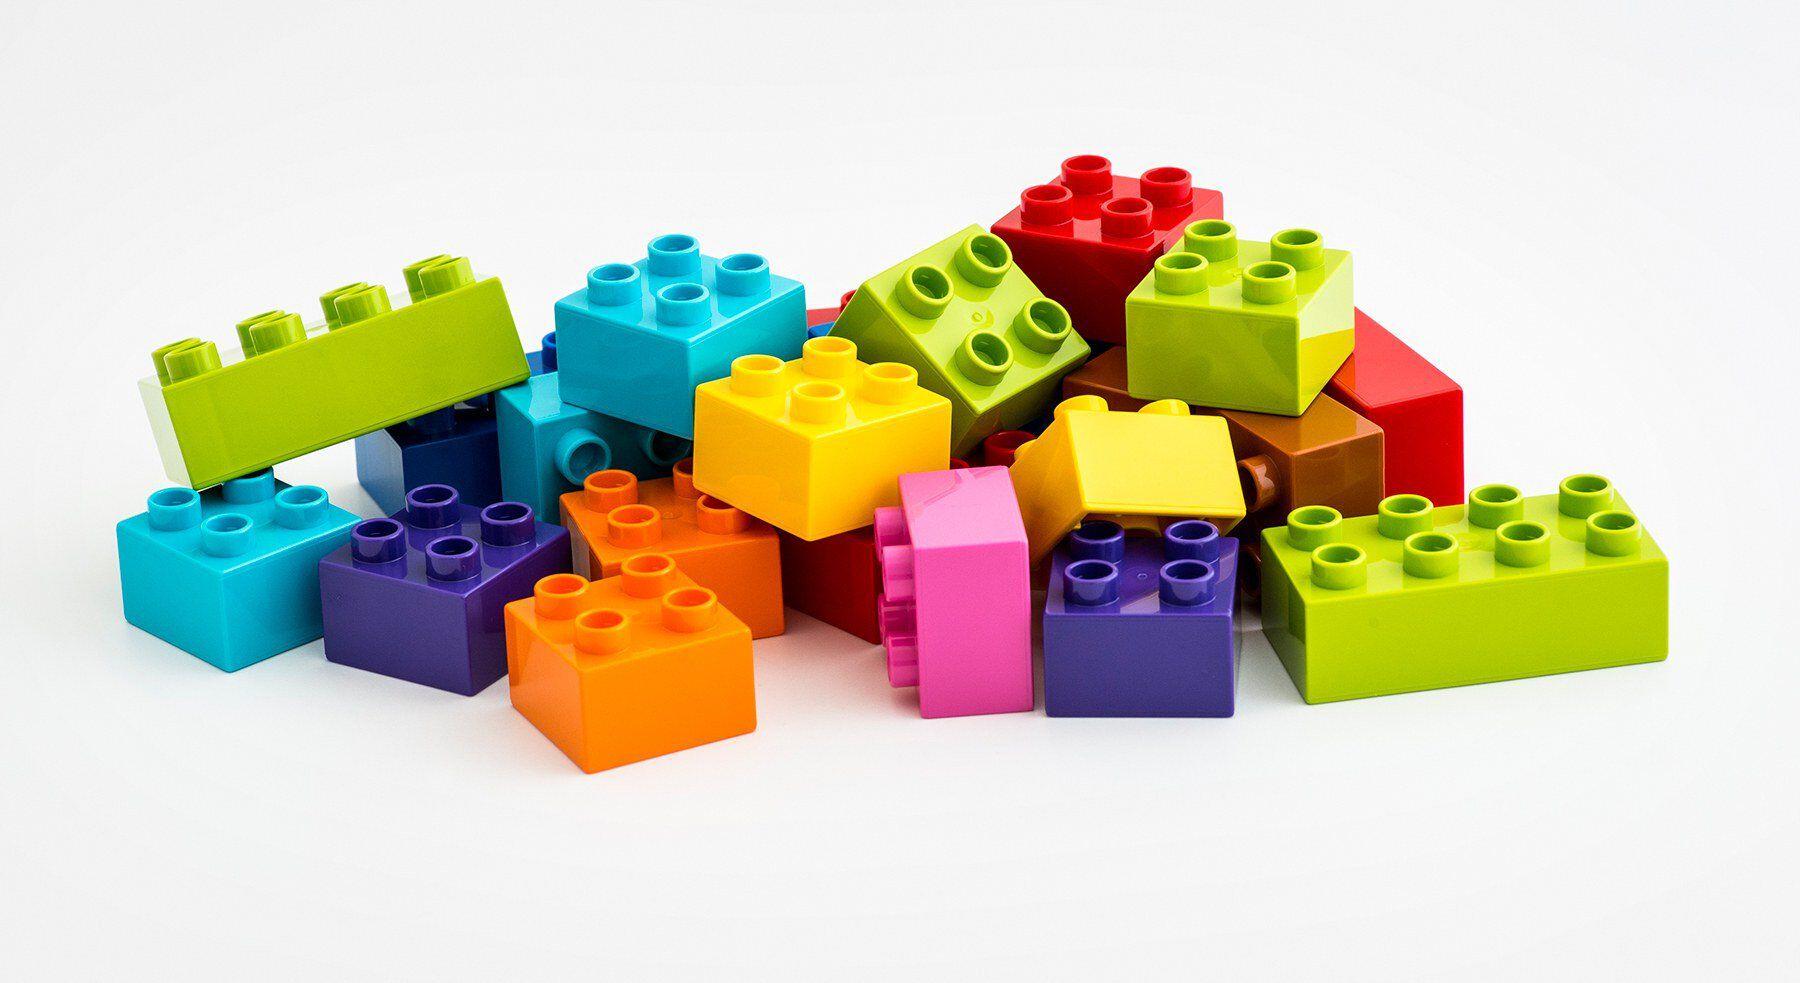 HighRes LEGO DUPLO bricks story